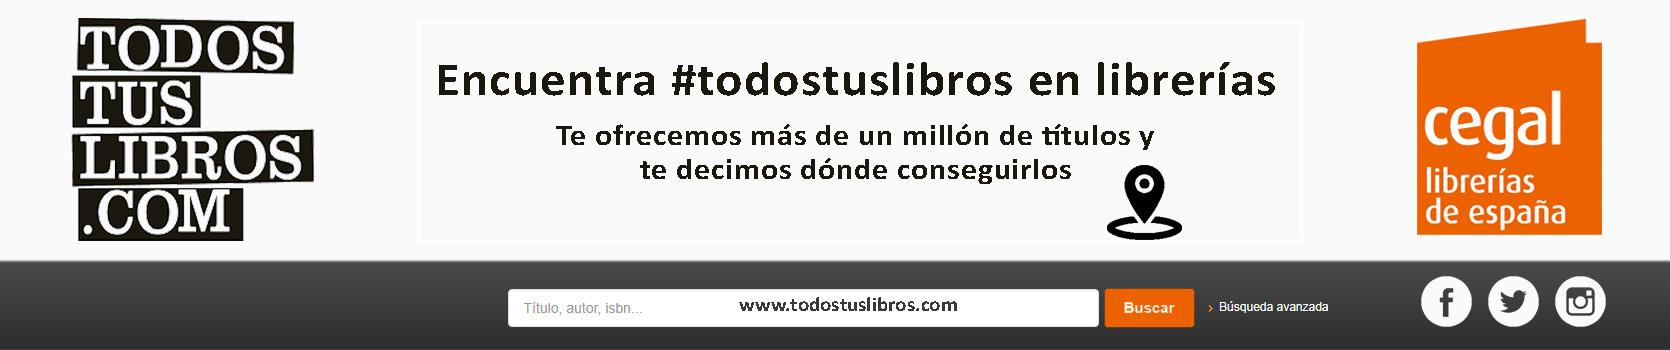 Todostuslibros.com, encuentra #todostuslibros en librerías. Cegal, librerías de España